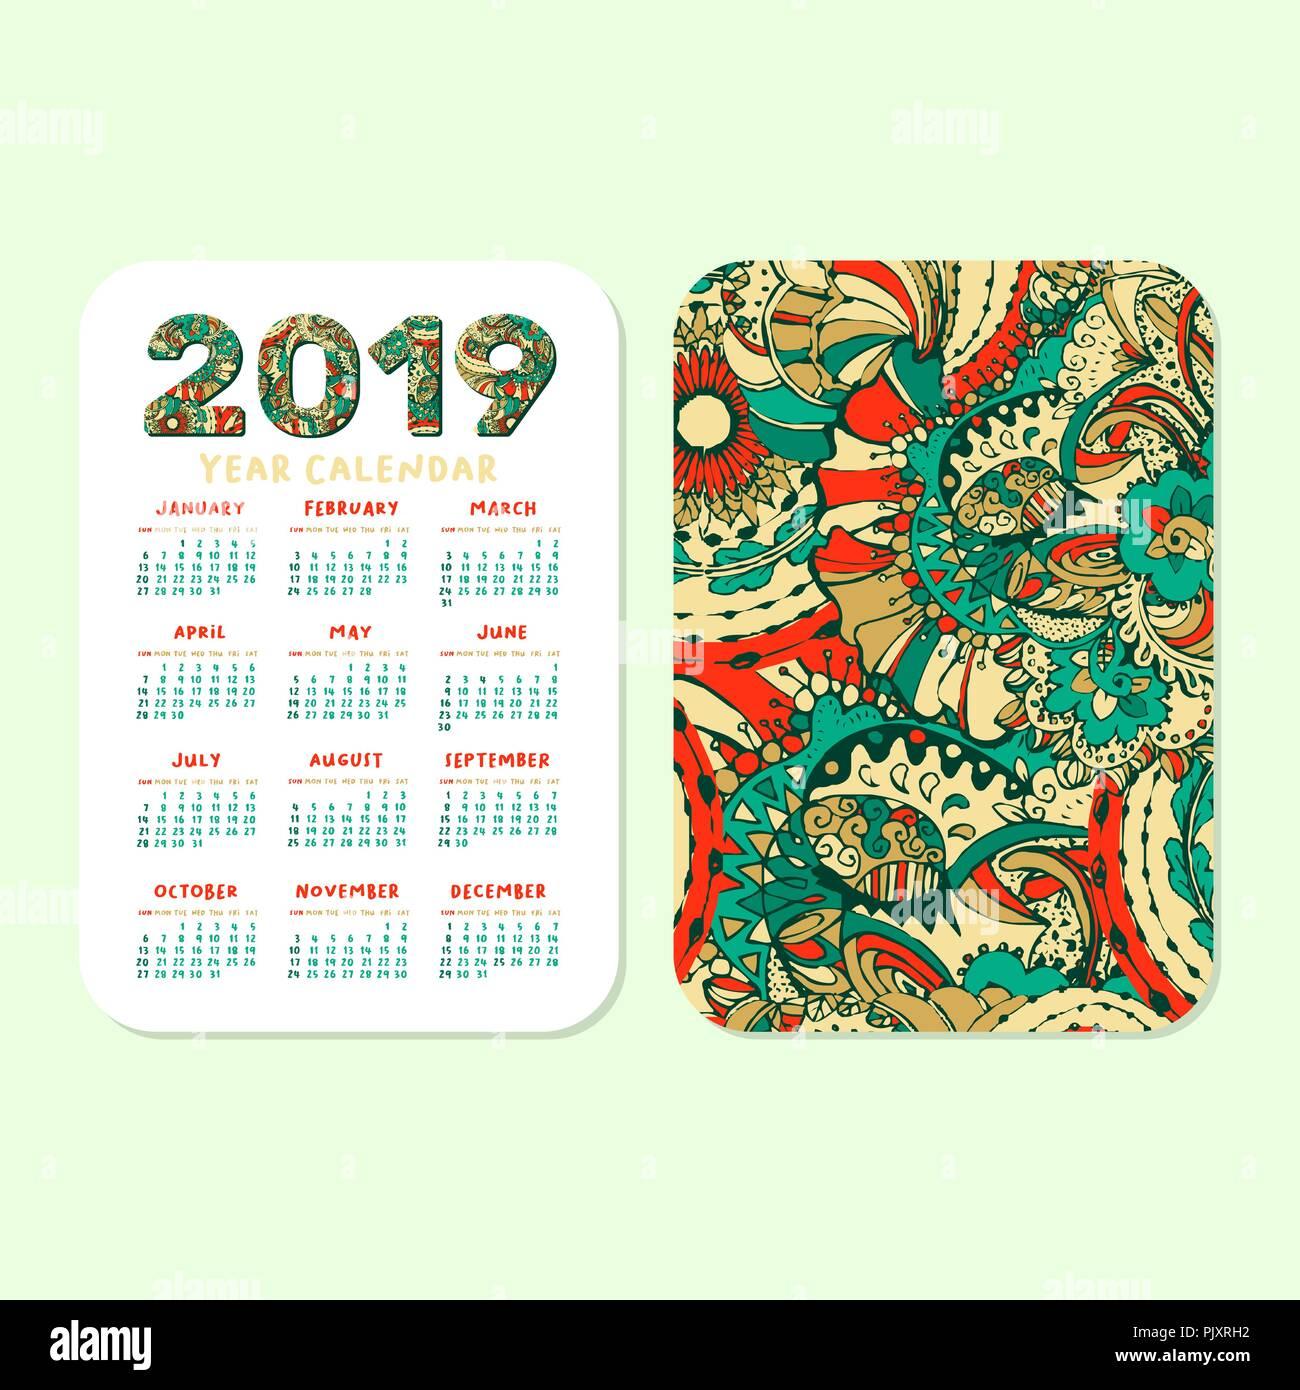 photograph regarding Printable Pocket Calendars named 2019 Pocket Calendar Inventory Images 2019 Pocket Calendar